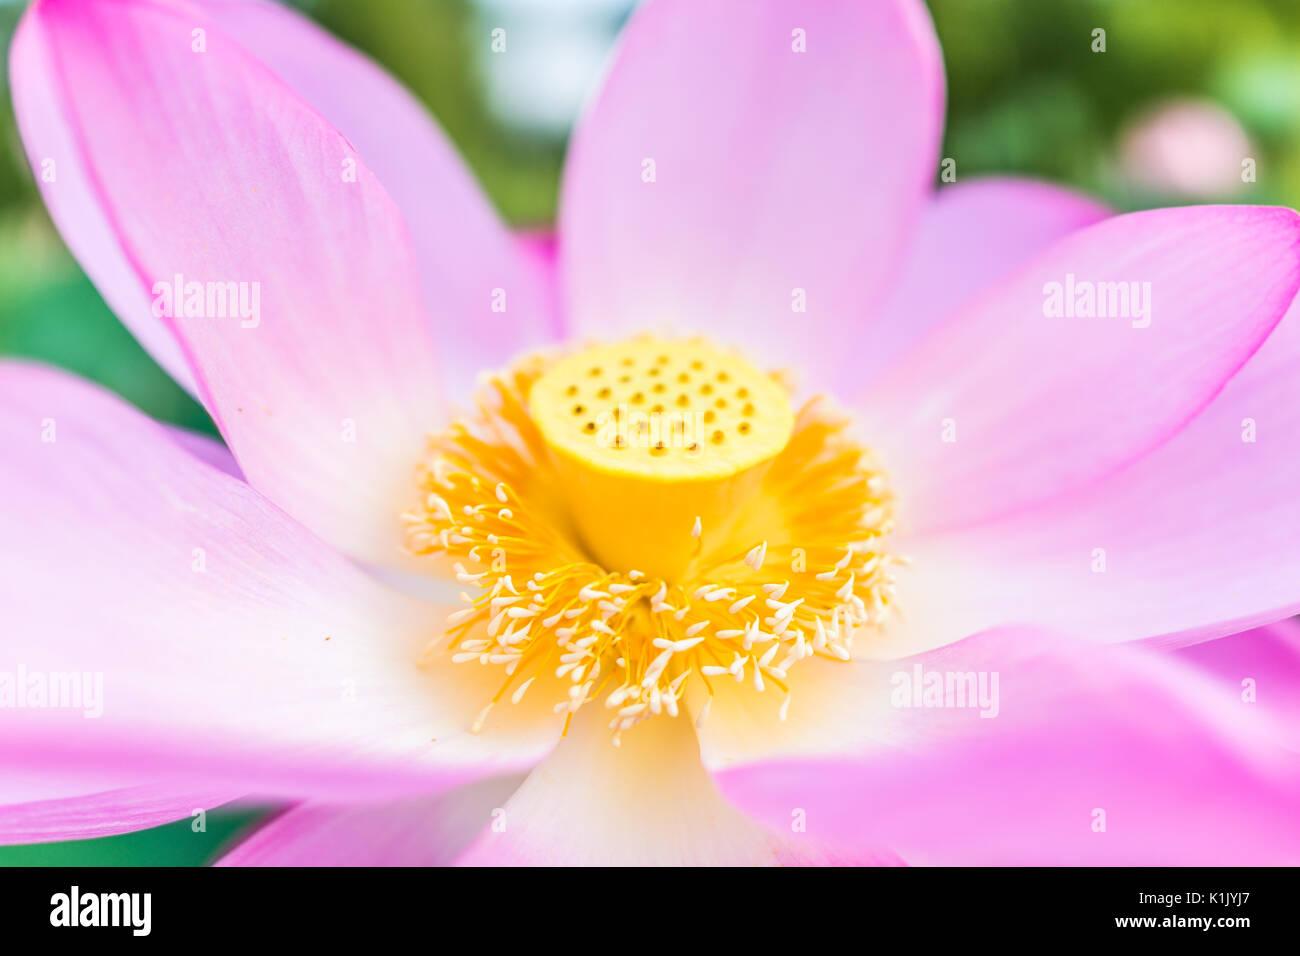 Macro Closeup Of Bright Pink Lotus Flower With Yellow Seedpod Inside